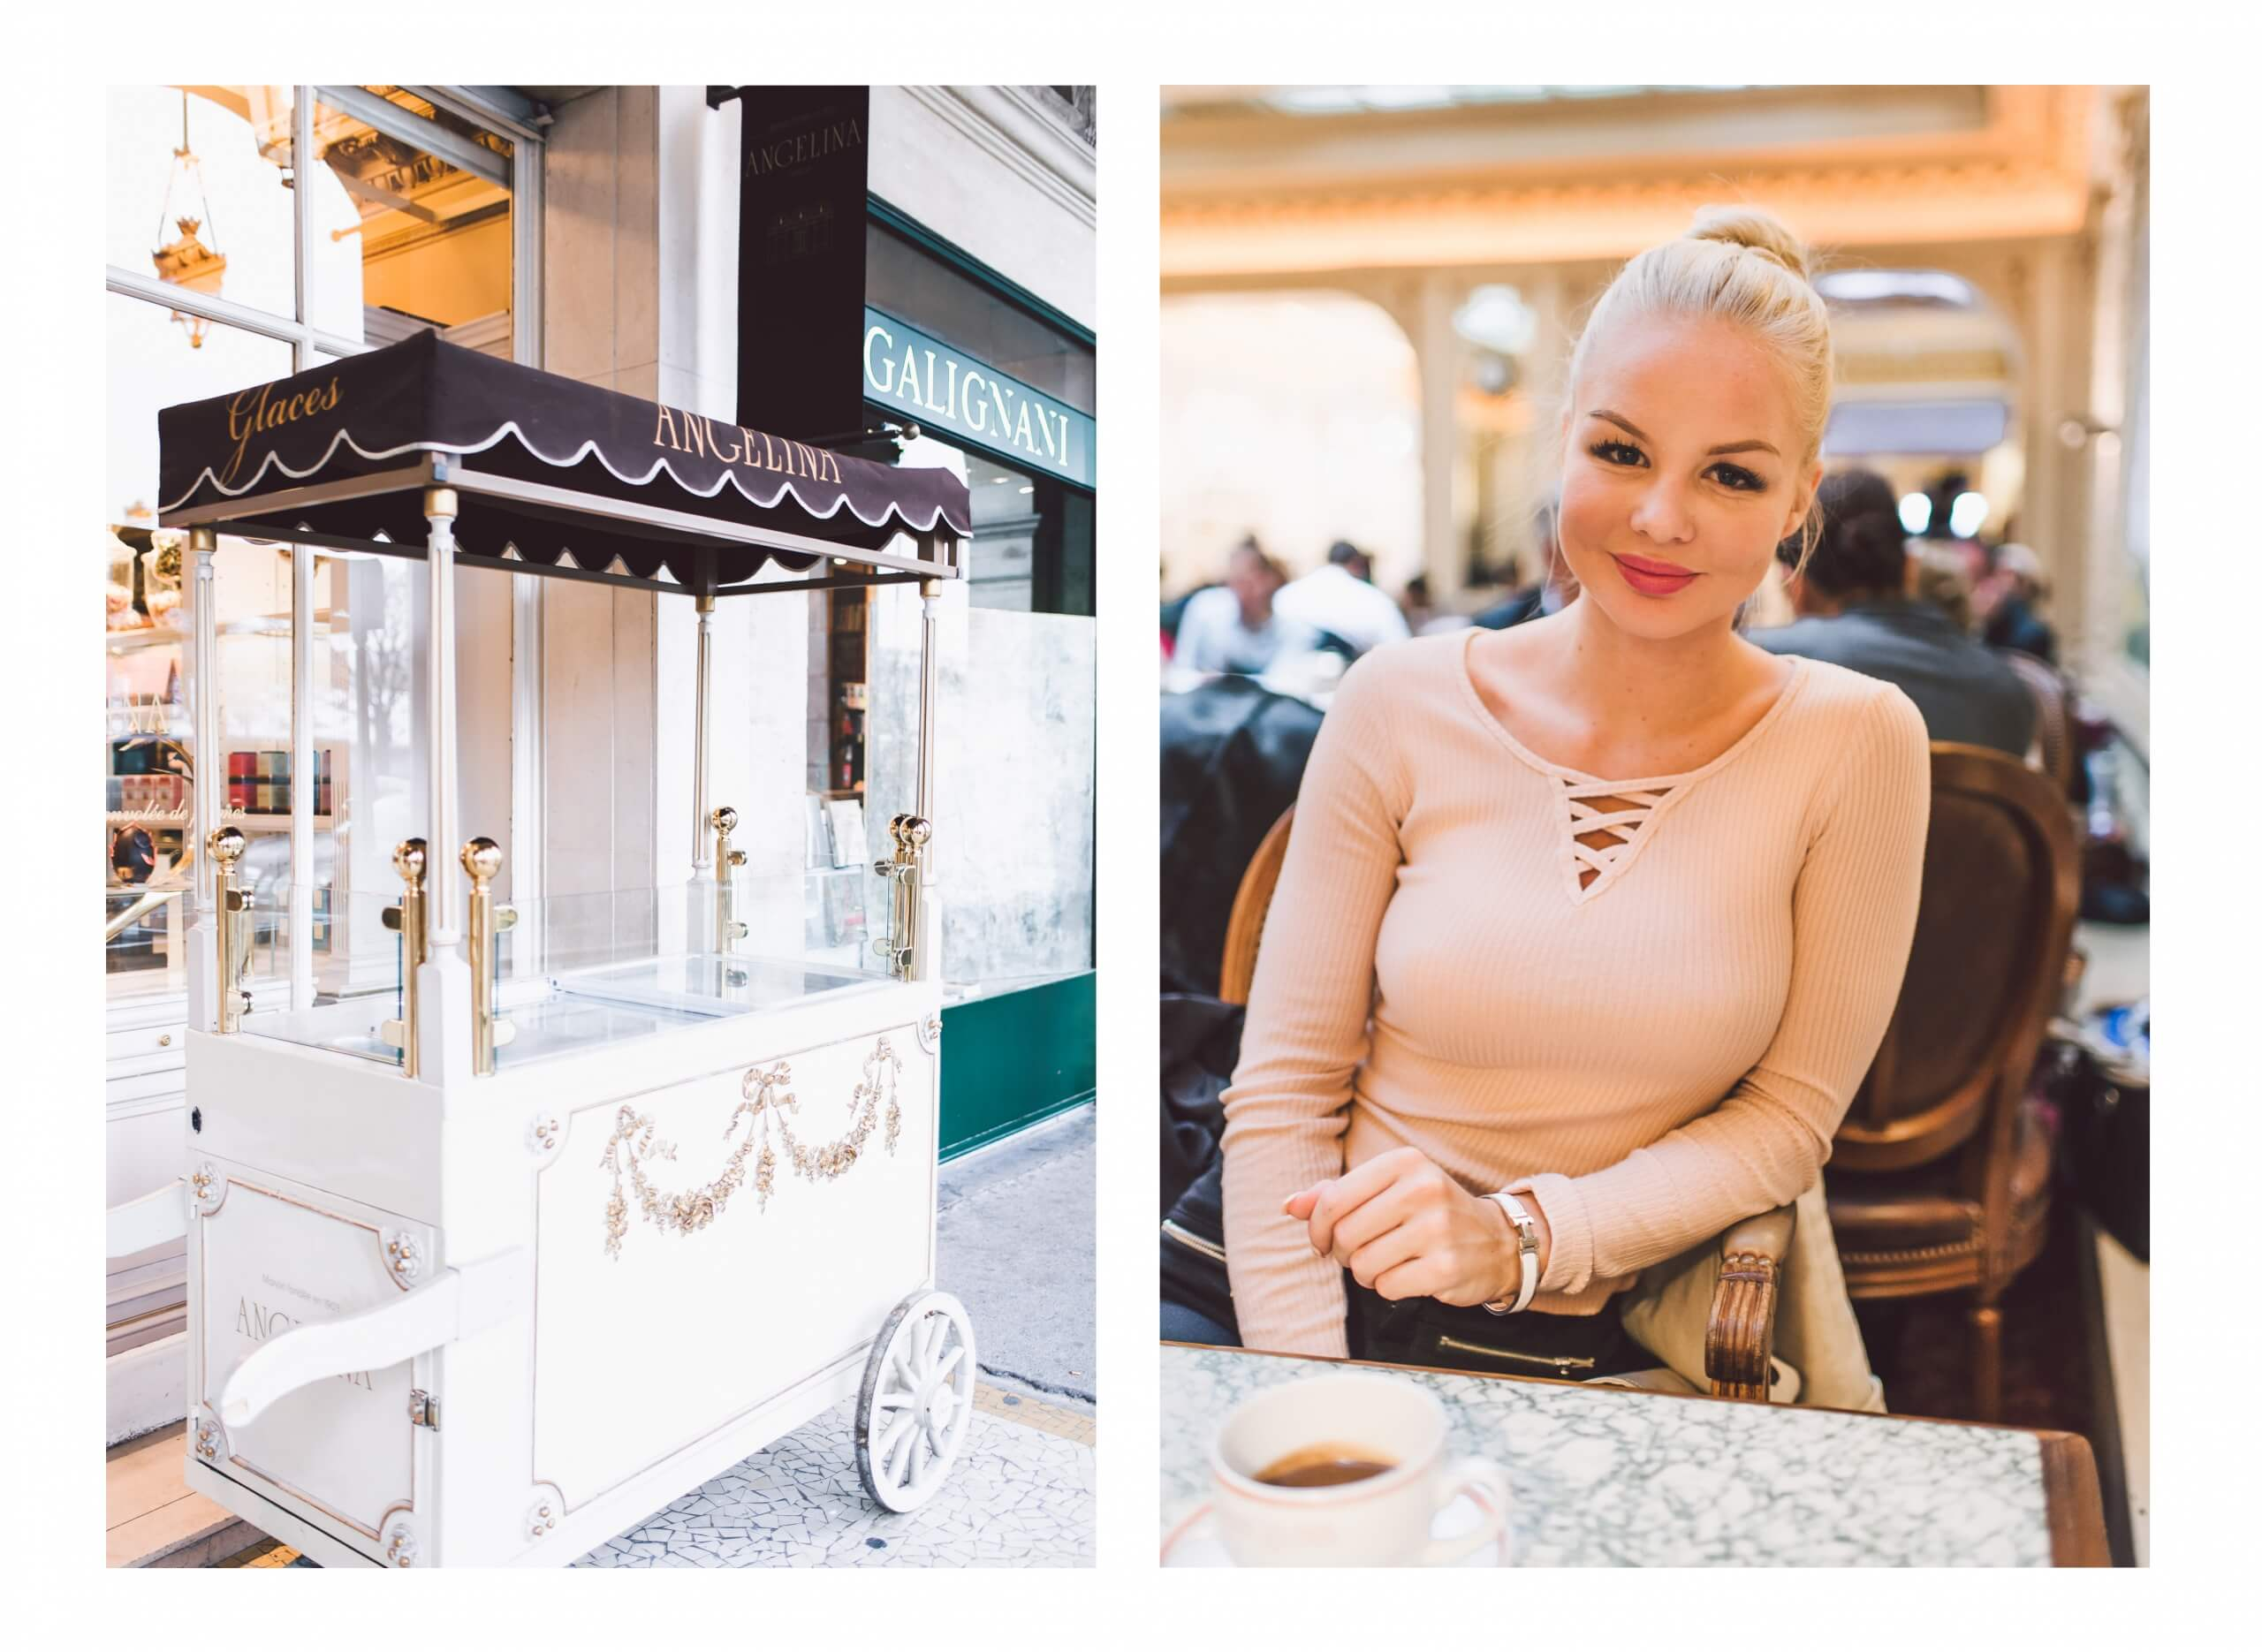 janni-deler-hot-chocolate-angelinas-parisDSC_2400 copy